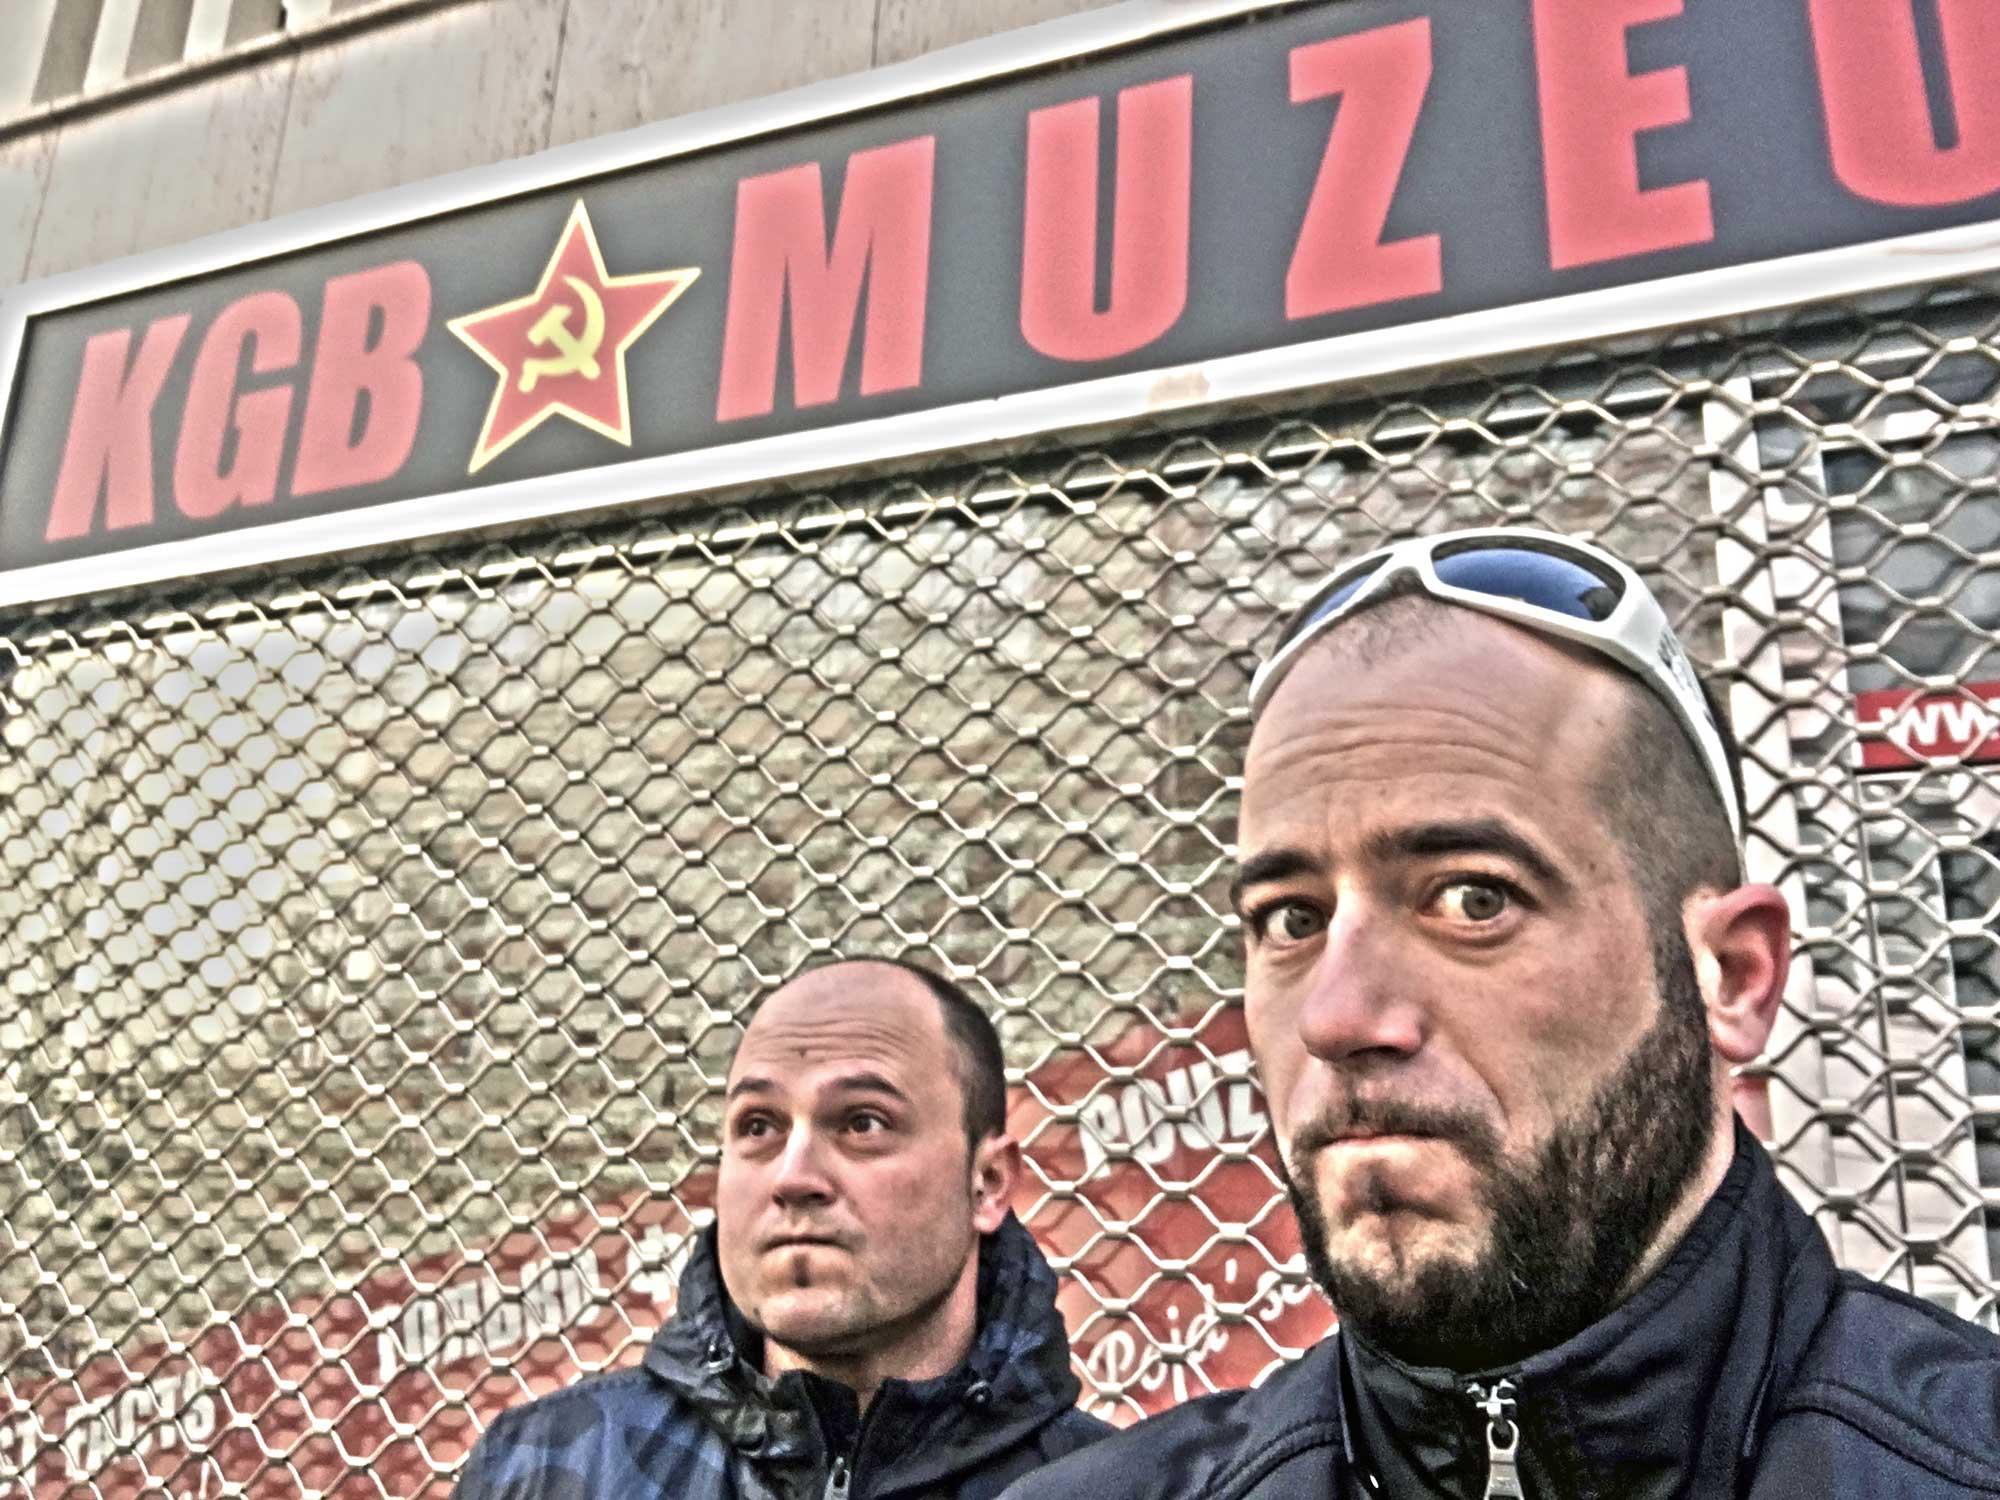 Impressum Dominik & Jürgen